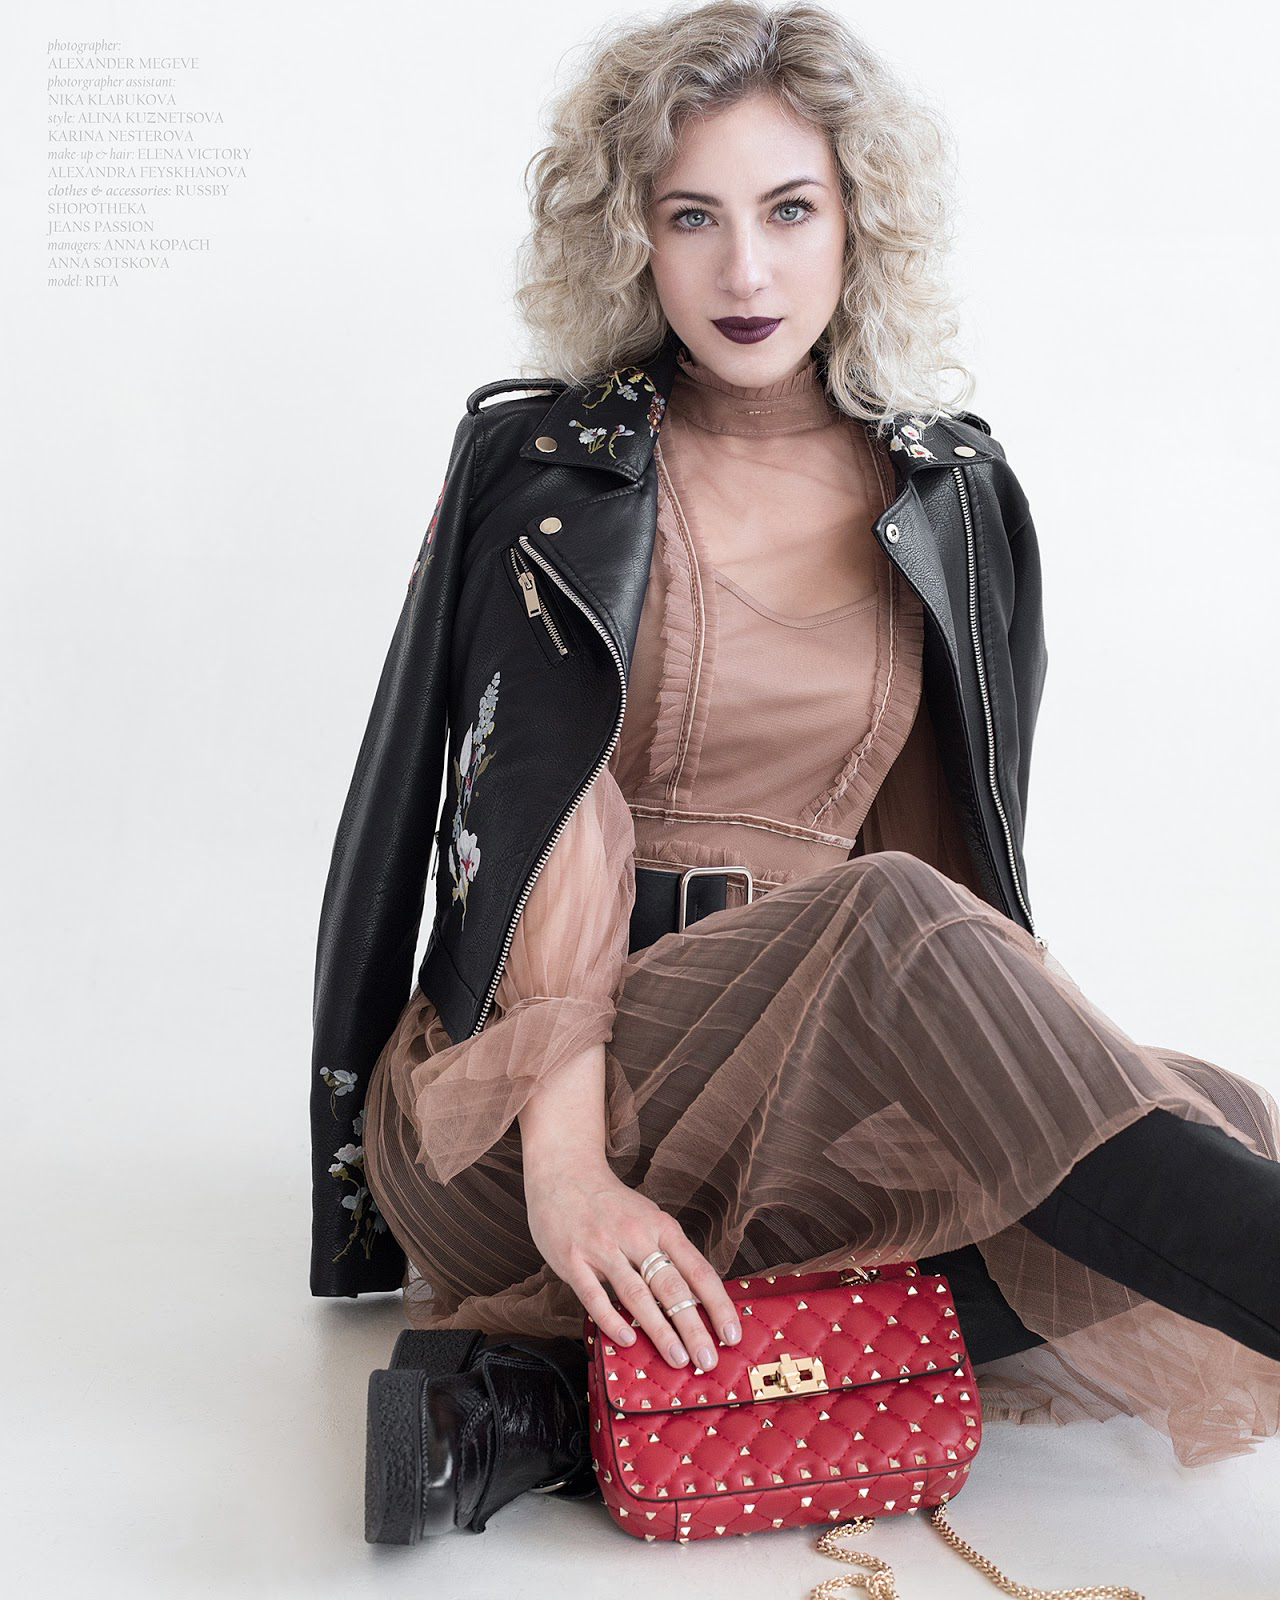 Margarita_Maslova_Ritalifestyle_Fashion_blogger_Moscow_